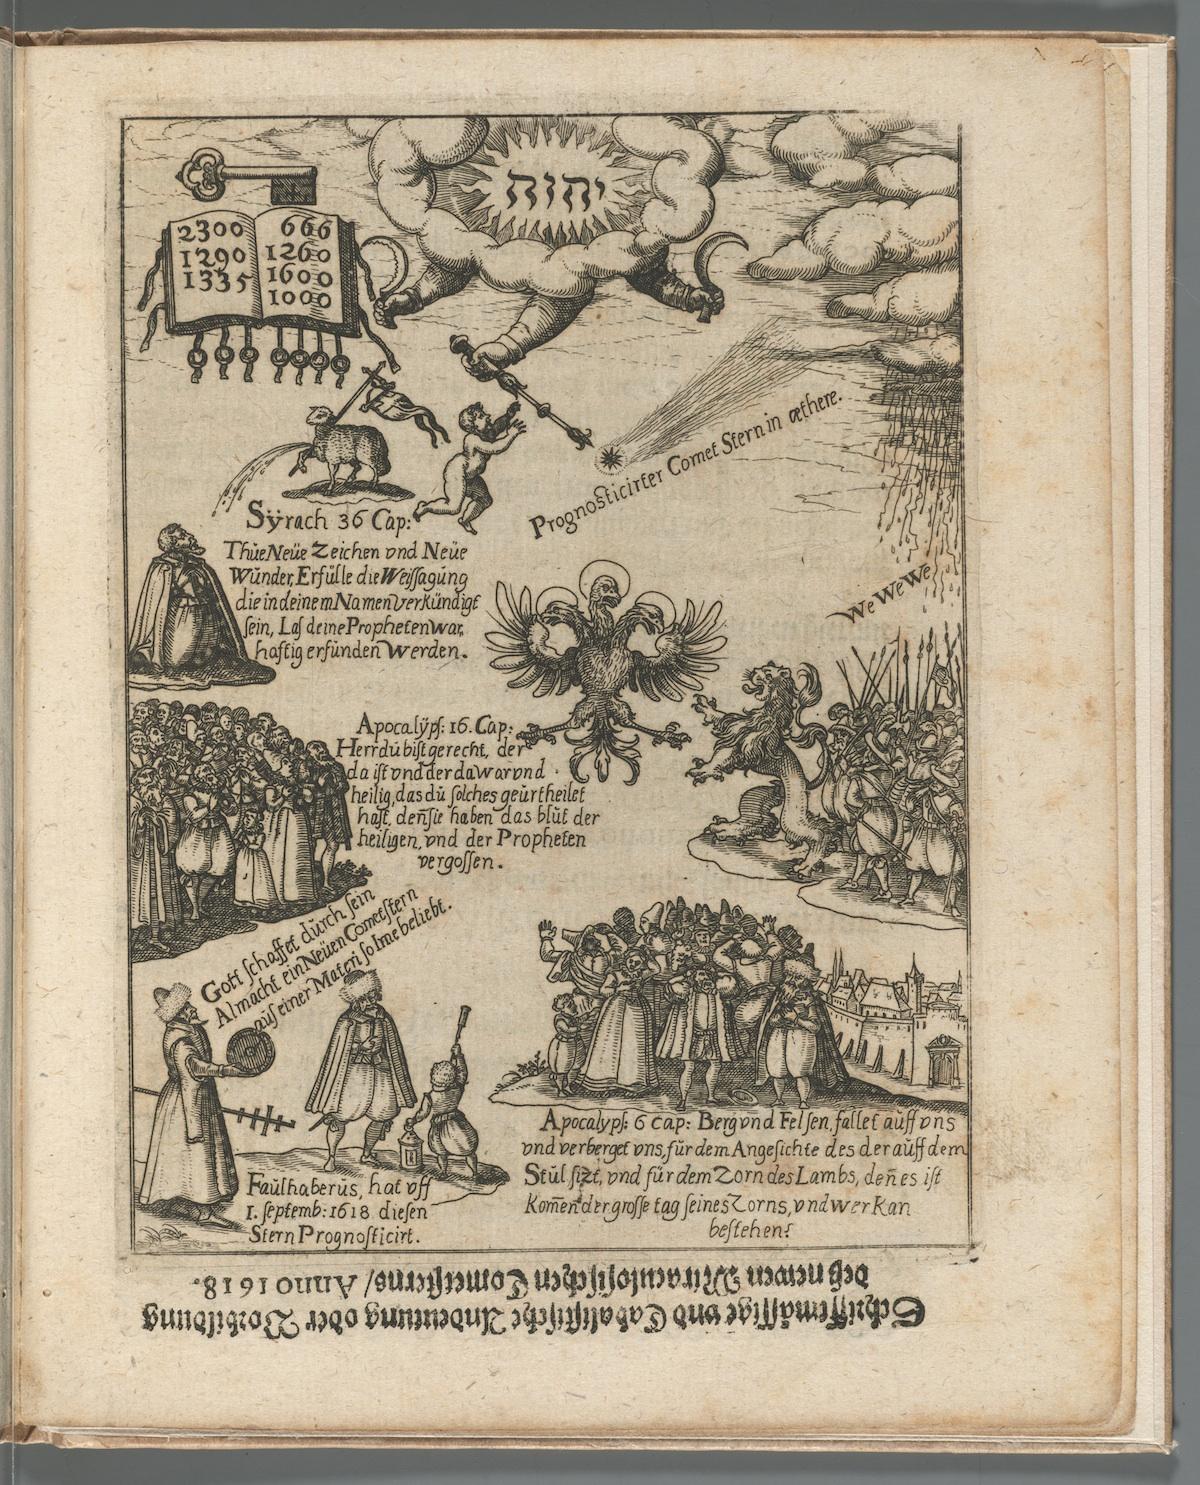 Faulhaber, Johannes, 1580-1635. Fama syderea nova. Nuremberg: S. Halbmayer, 1618. *GC6.F2735.618f. Houghton Library, Harvard University.